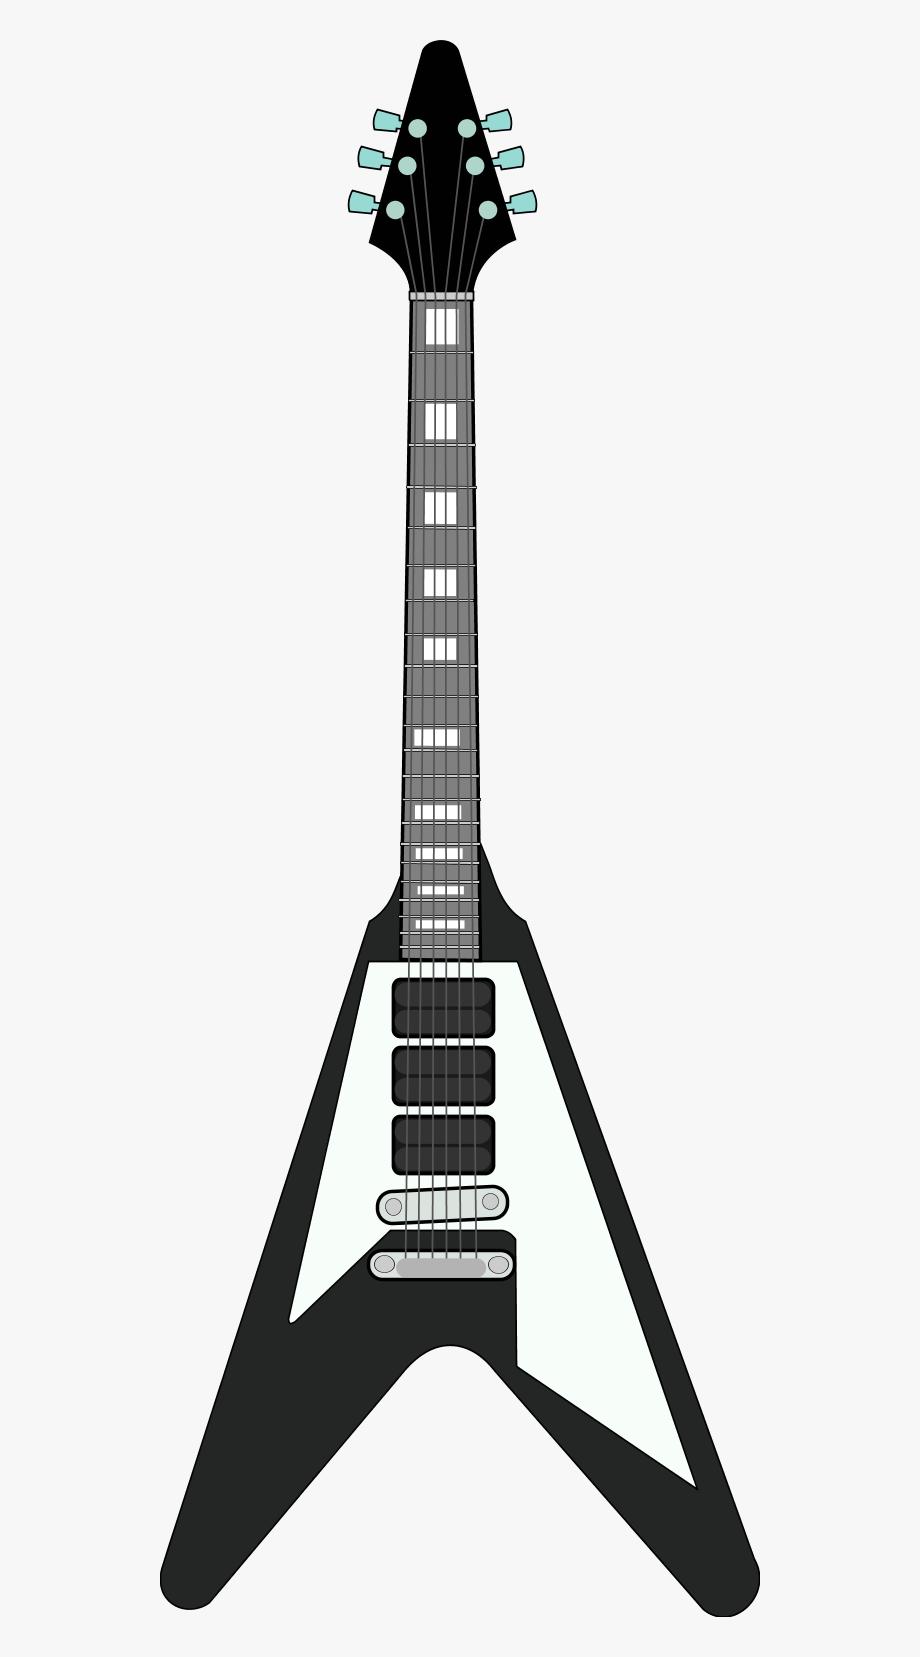 Guitar Black And White Black And White Guitar Clipart.